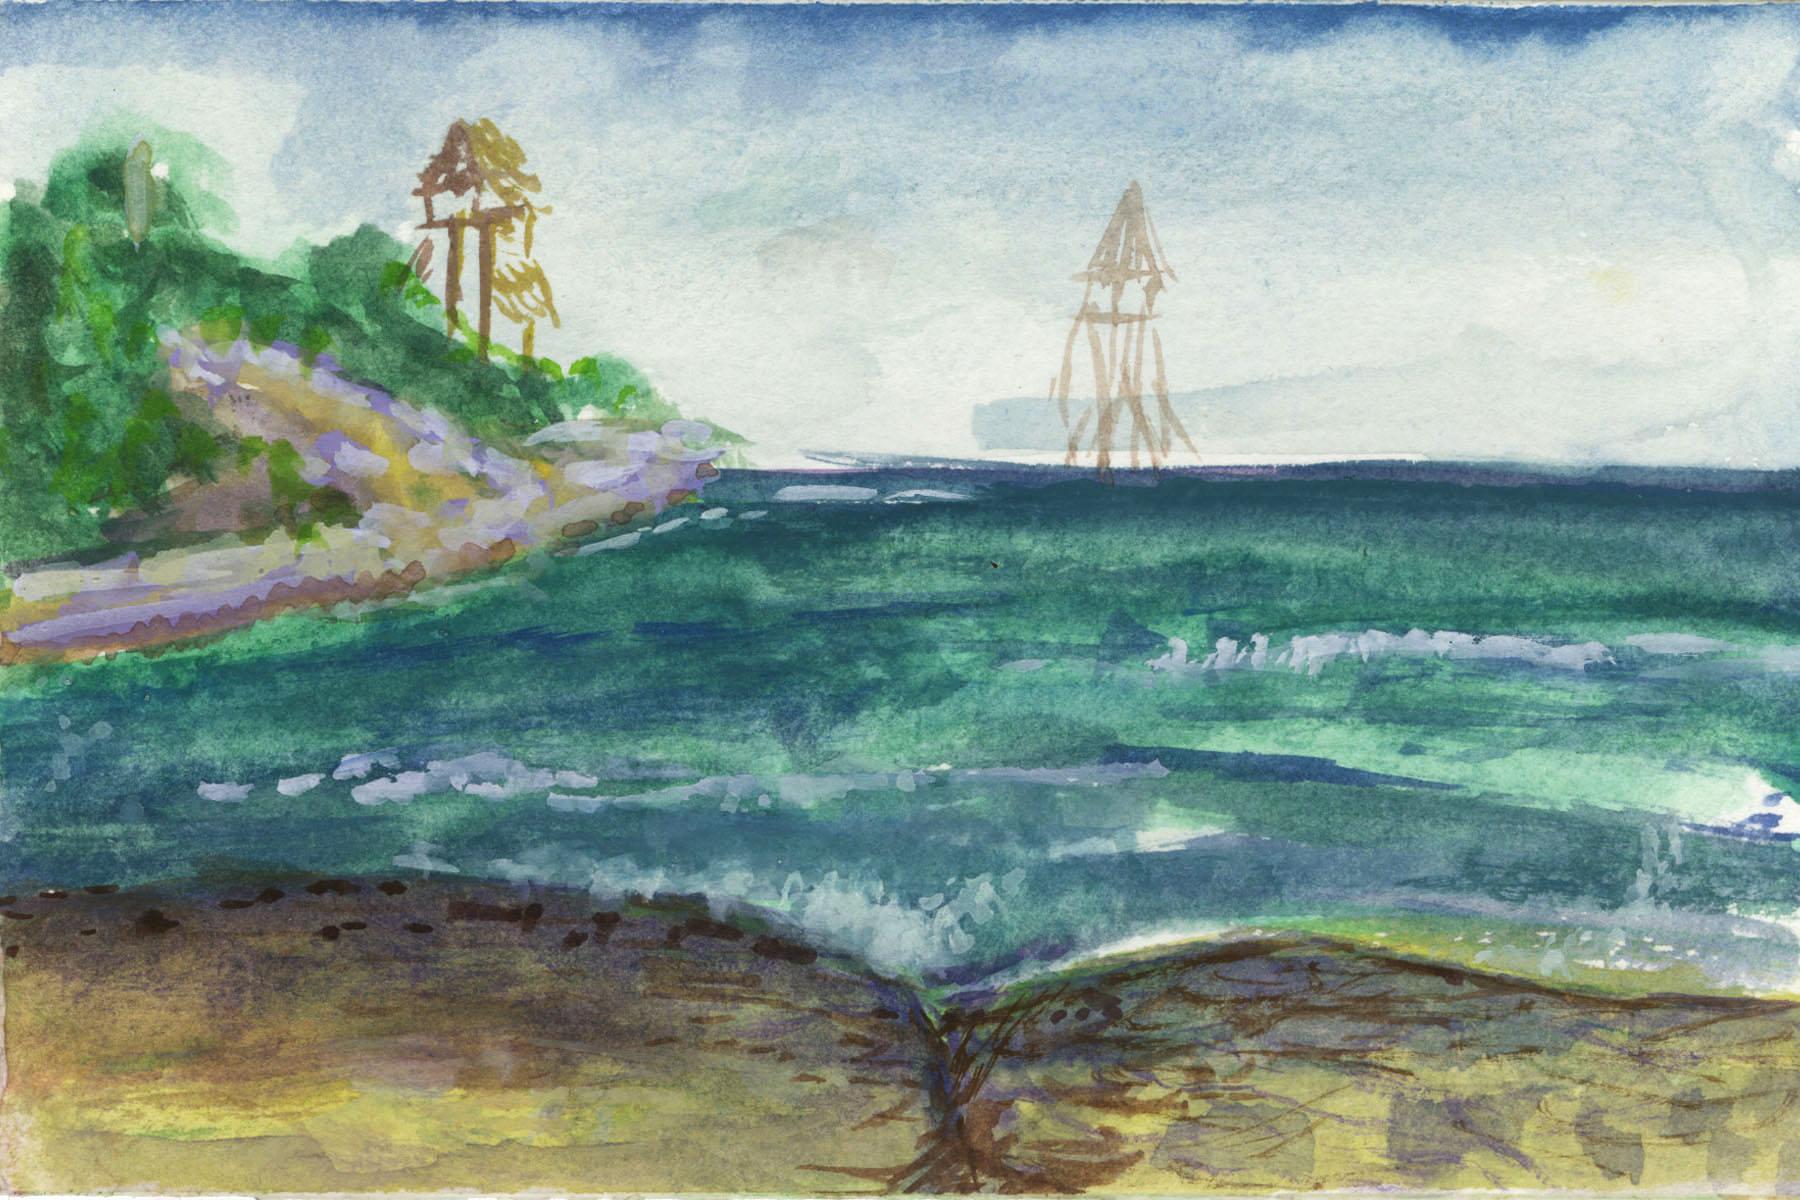 "Isla Mujeres, Gouache, 4 x 6"" 2017."